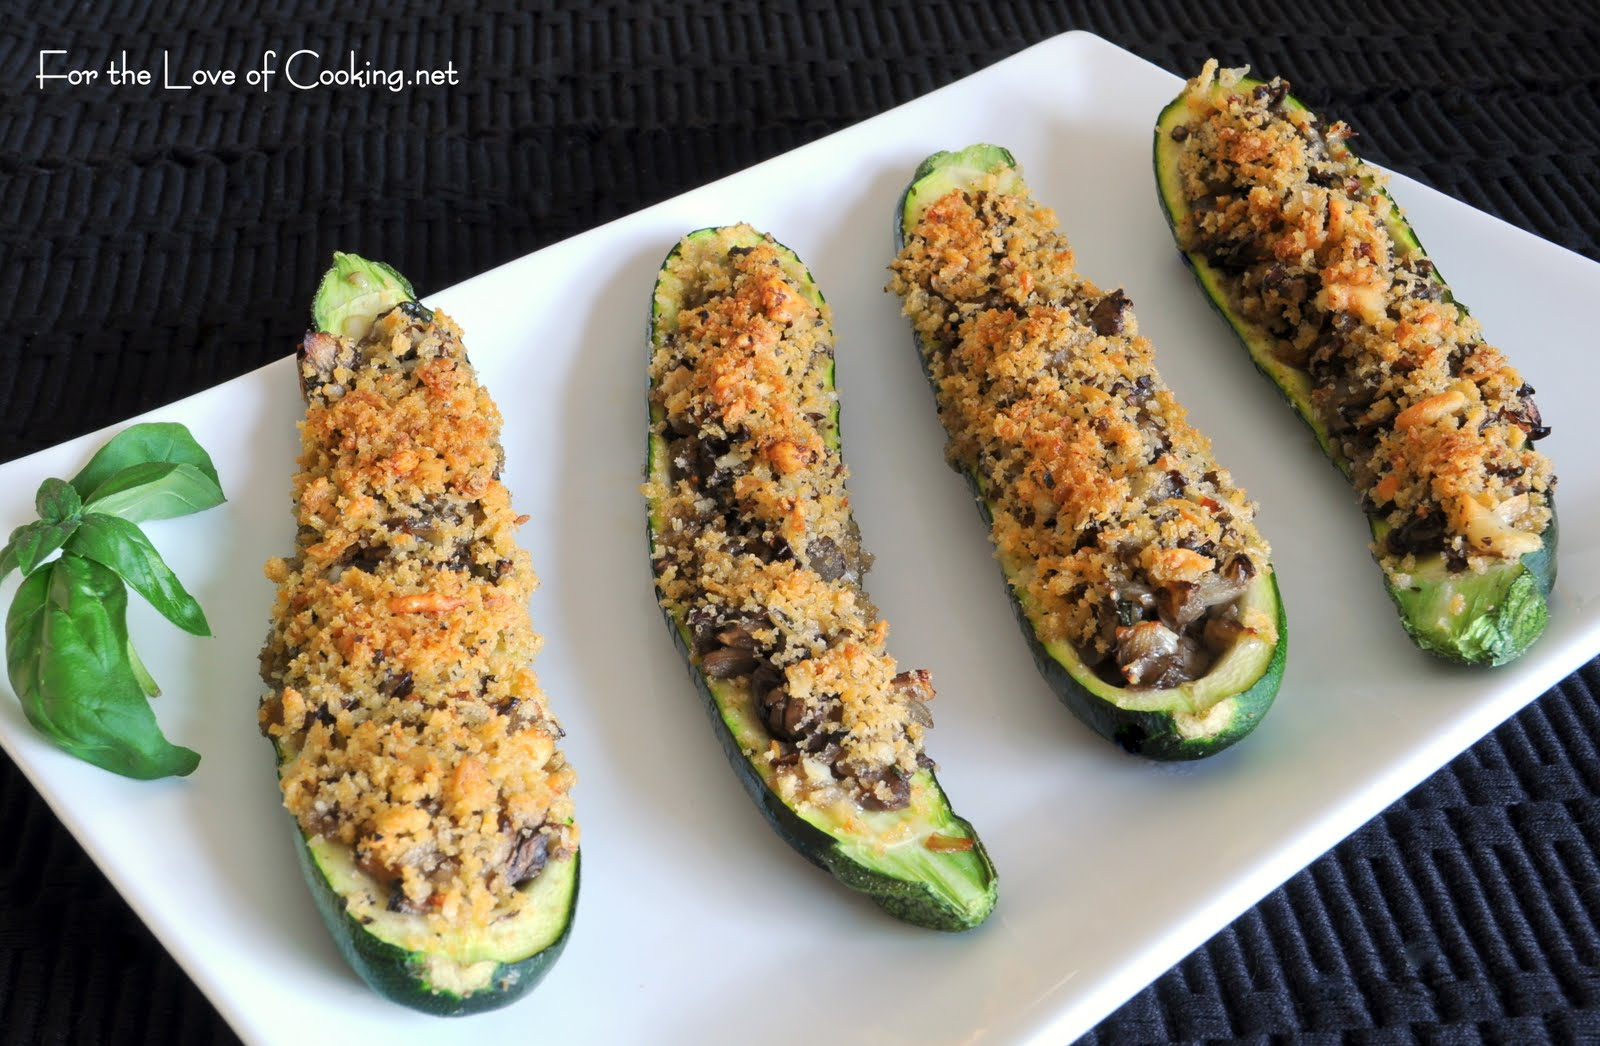 Vegetarian Stuffed Zucchini With Parmesan Panko Recipes — Dishmaps